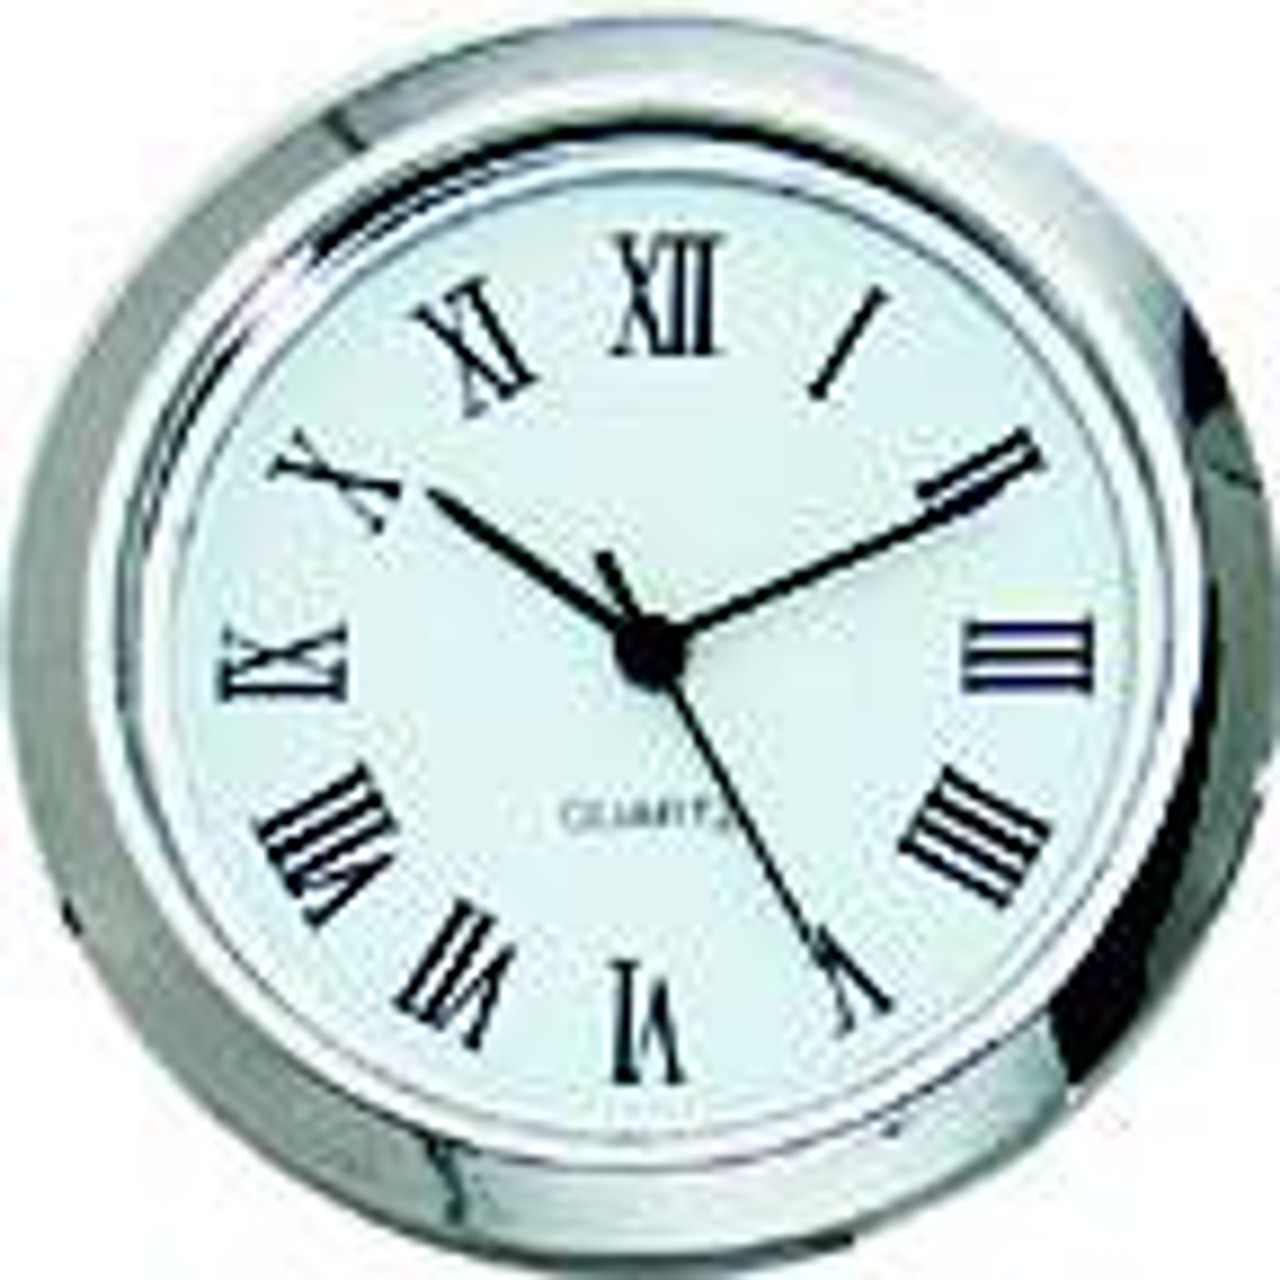 Chrome Bezel 1-7/16 (36mm) White Face Roman Clock Fit-Up